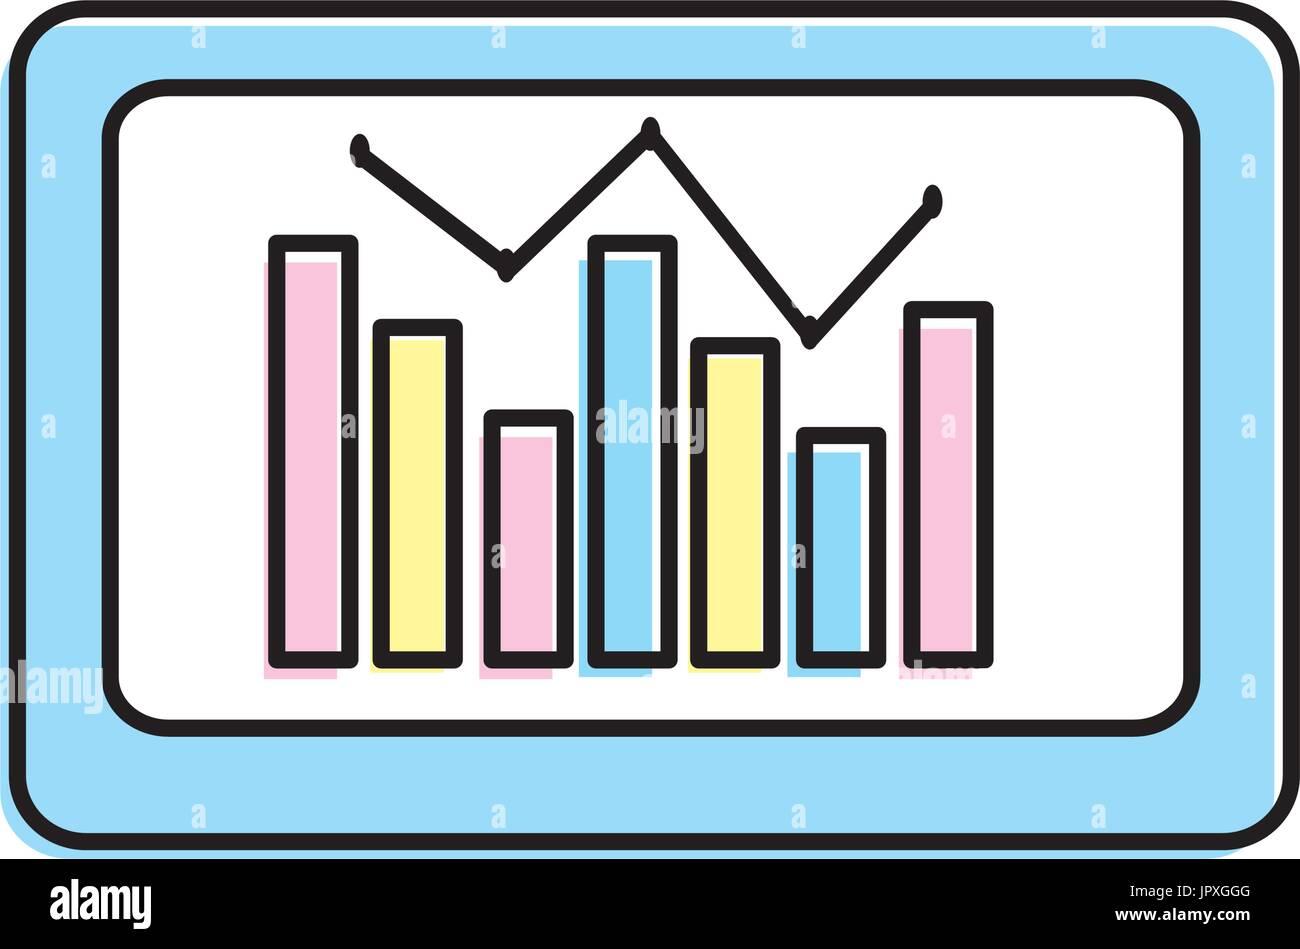 computer with statistics diagram bar - Stock Image